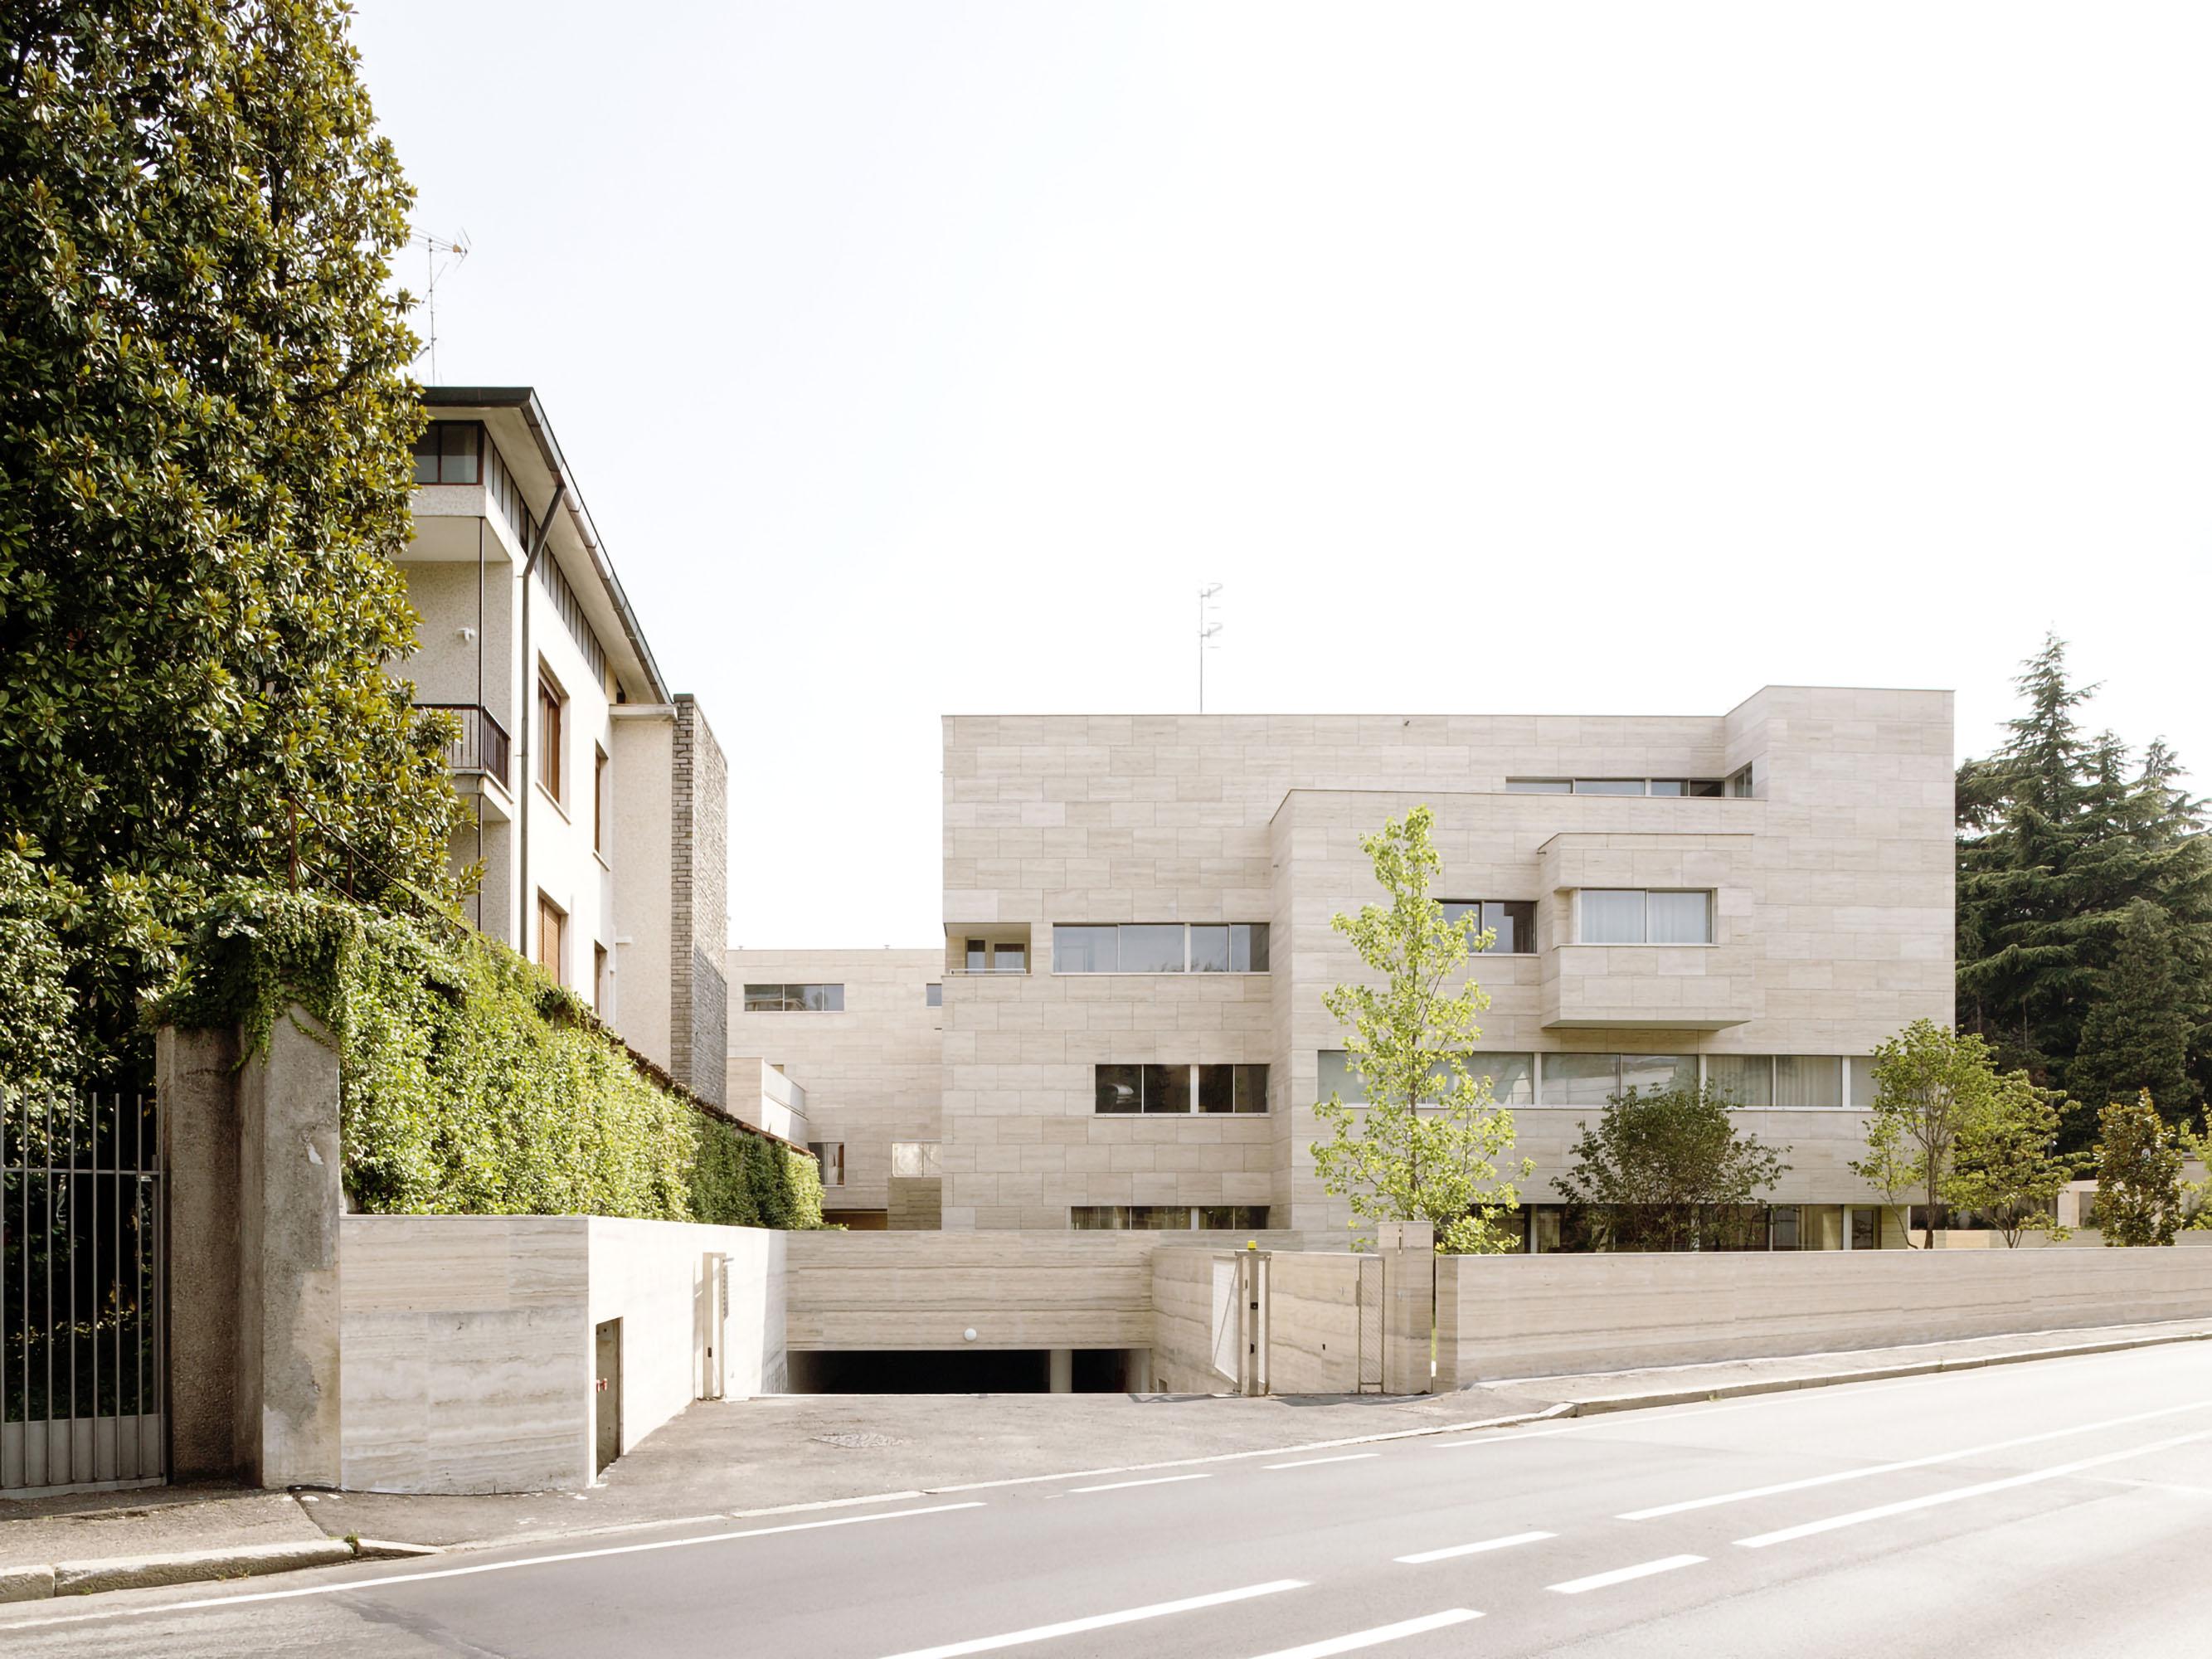 IT04_Residential Complex in Gallarate ©Francesca-Ióvene